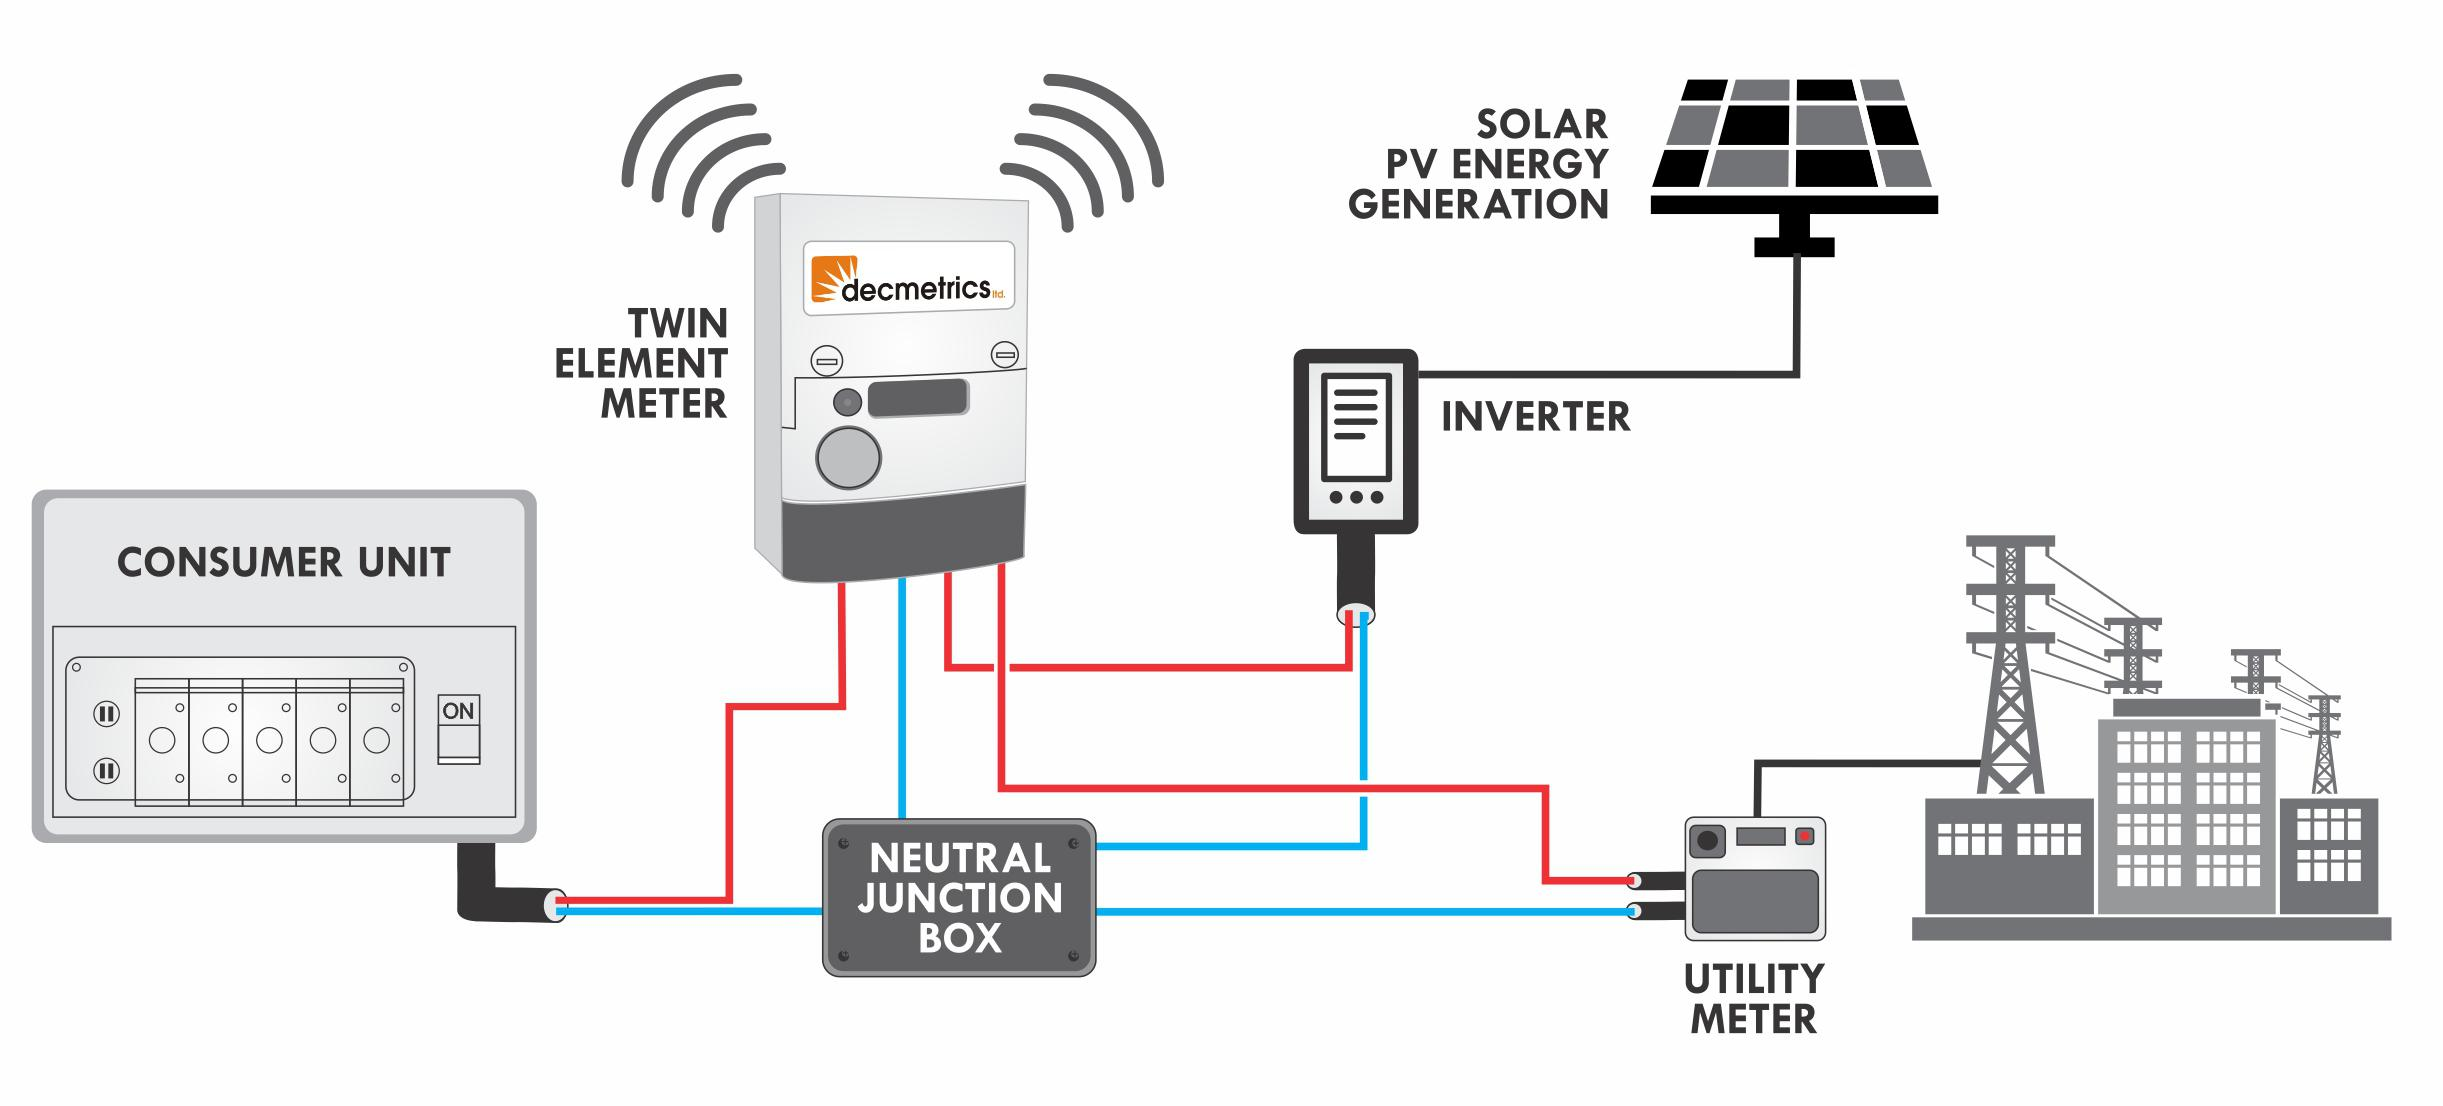 solar pv solar pv net metering schematic diagram solar net metering wiring diagram solar metering wiring [ 2443 x 1106 Pixel ]